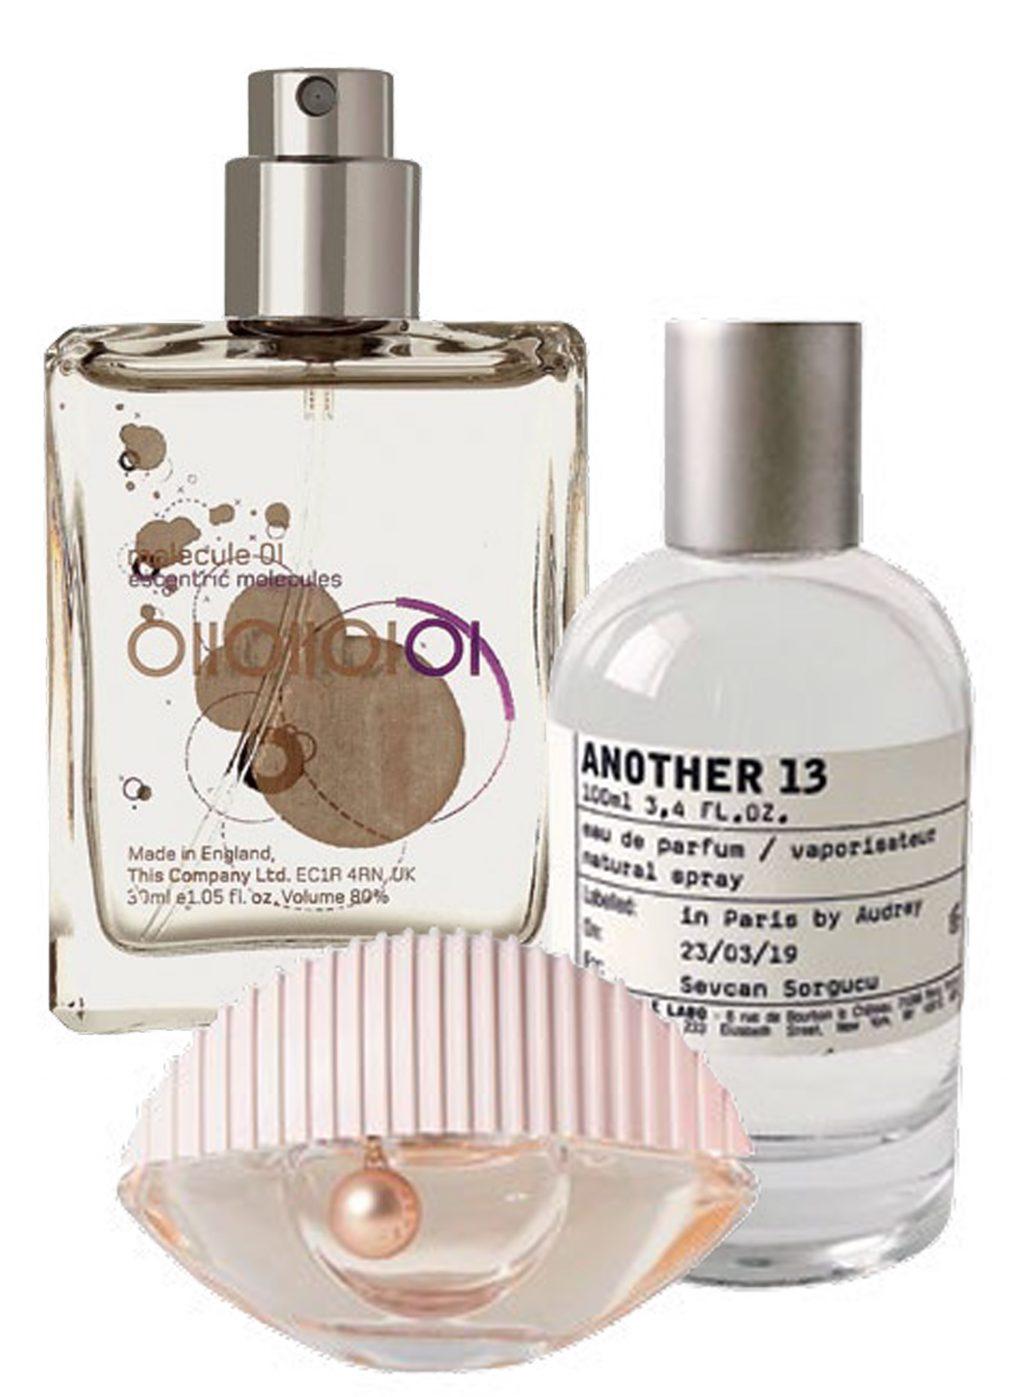 mùi hương nude scent